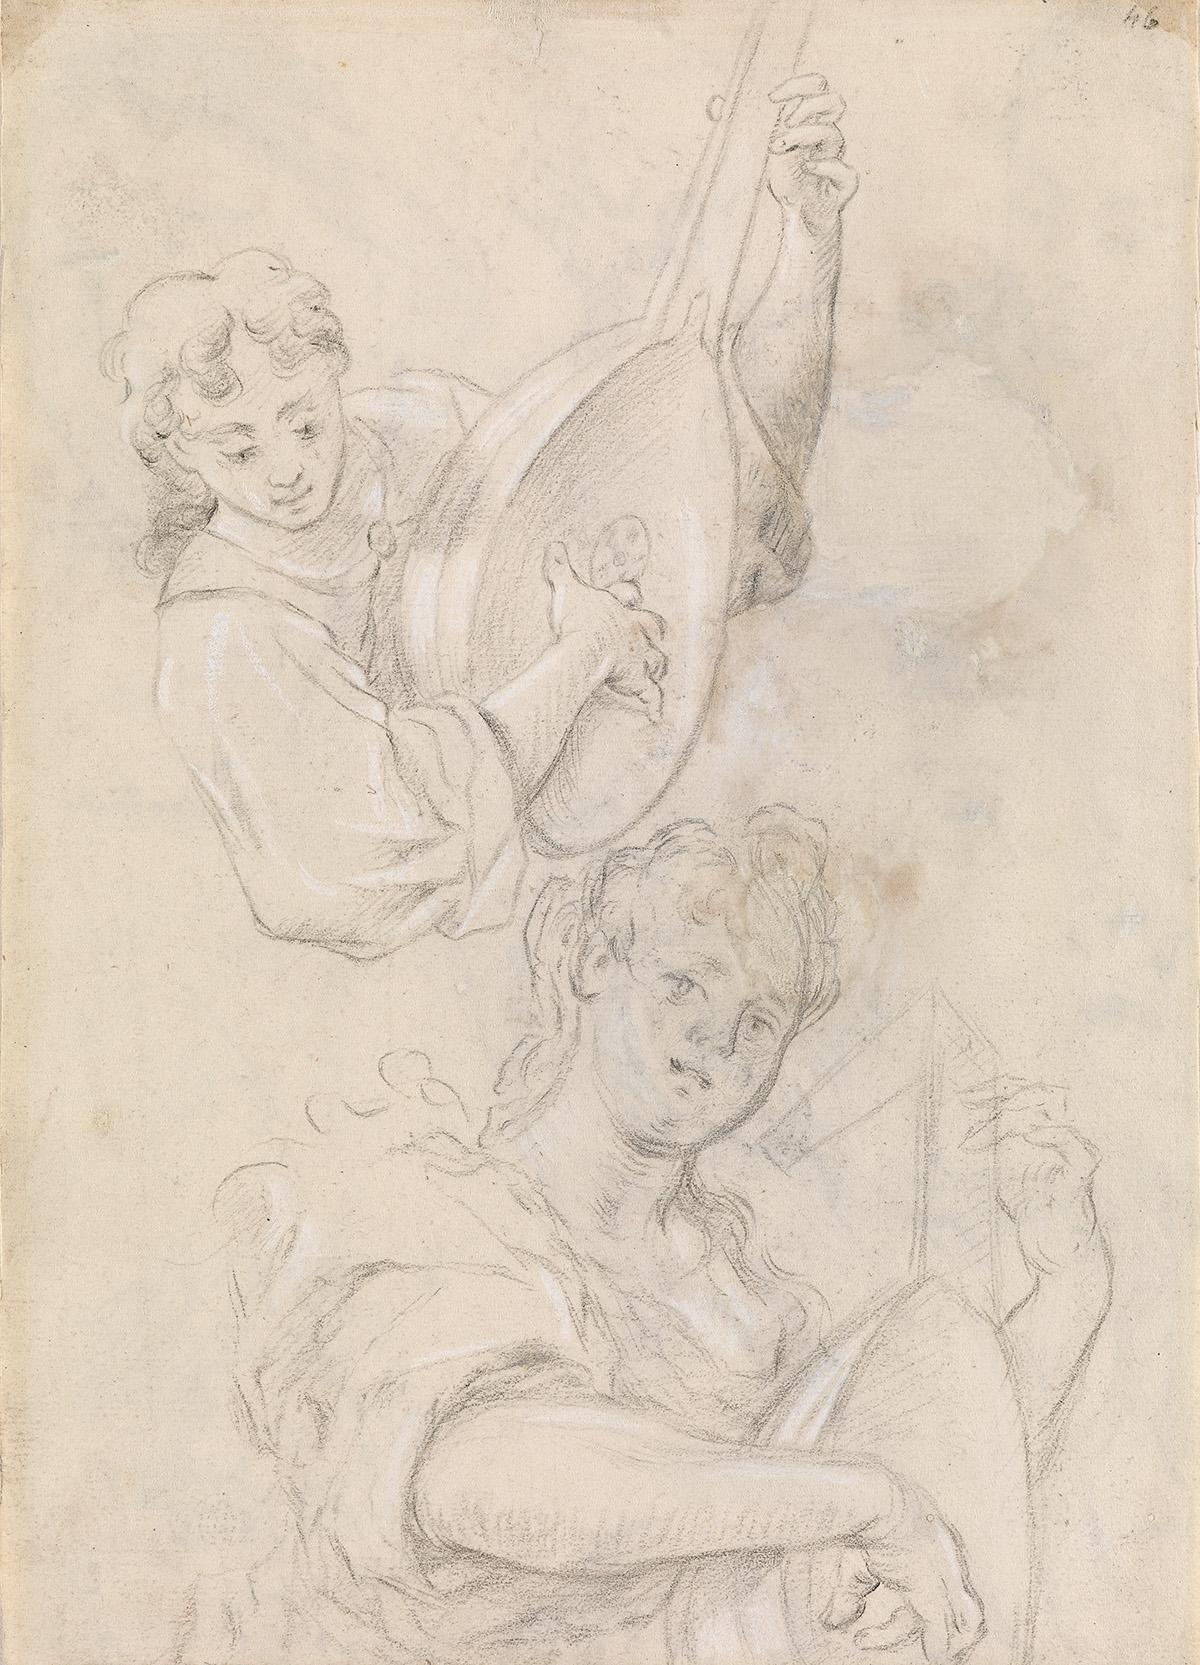 ITALIAN-SCHOOL-17TH-CENTURY-Studies-of-a-Lute-Player